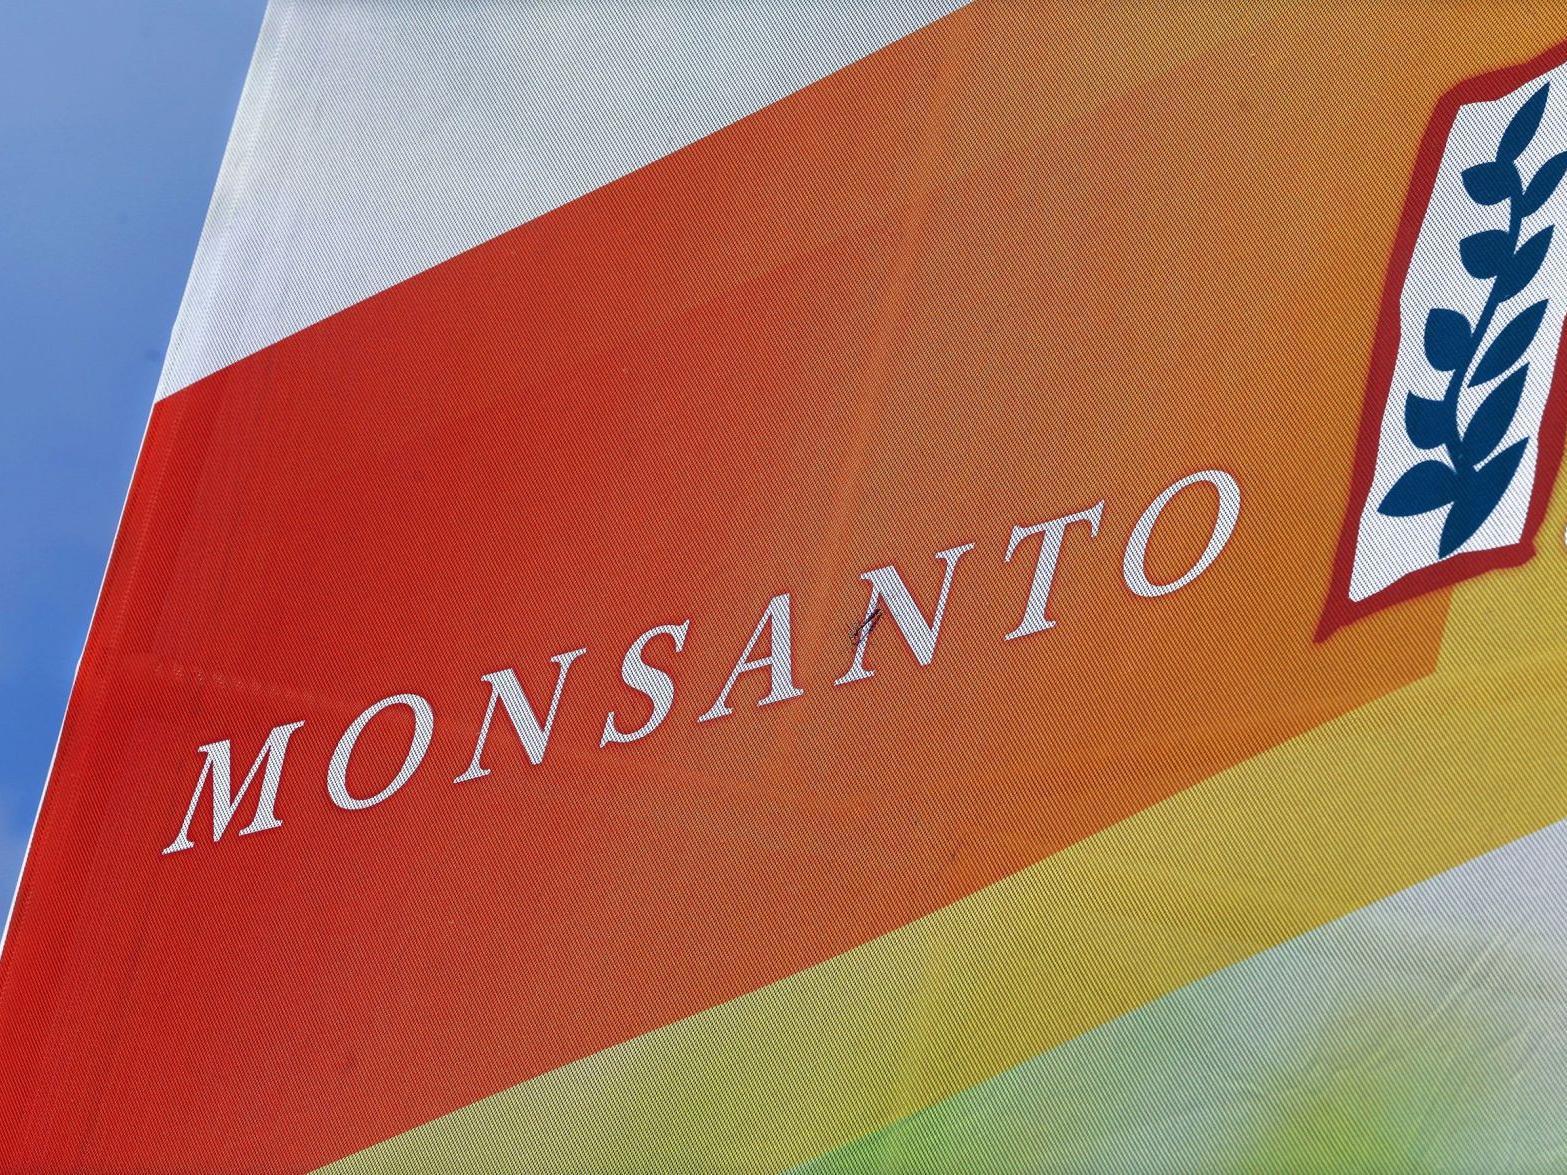 Monsanto board deciding on Bayer offer, sources say   Business   stltoday.com